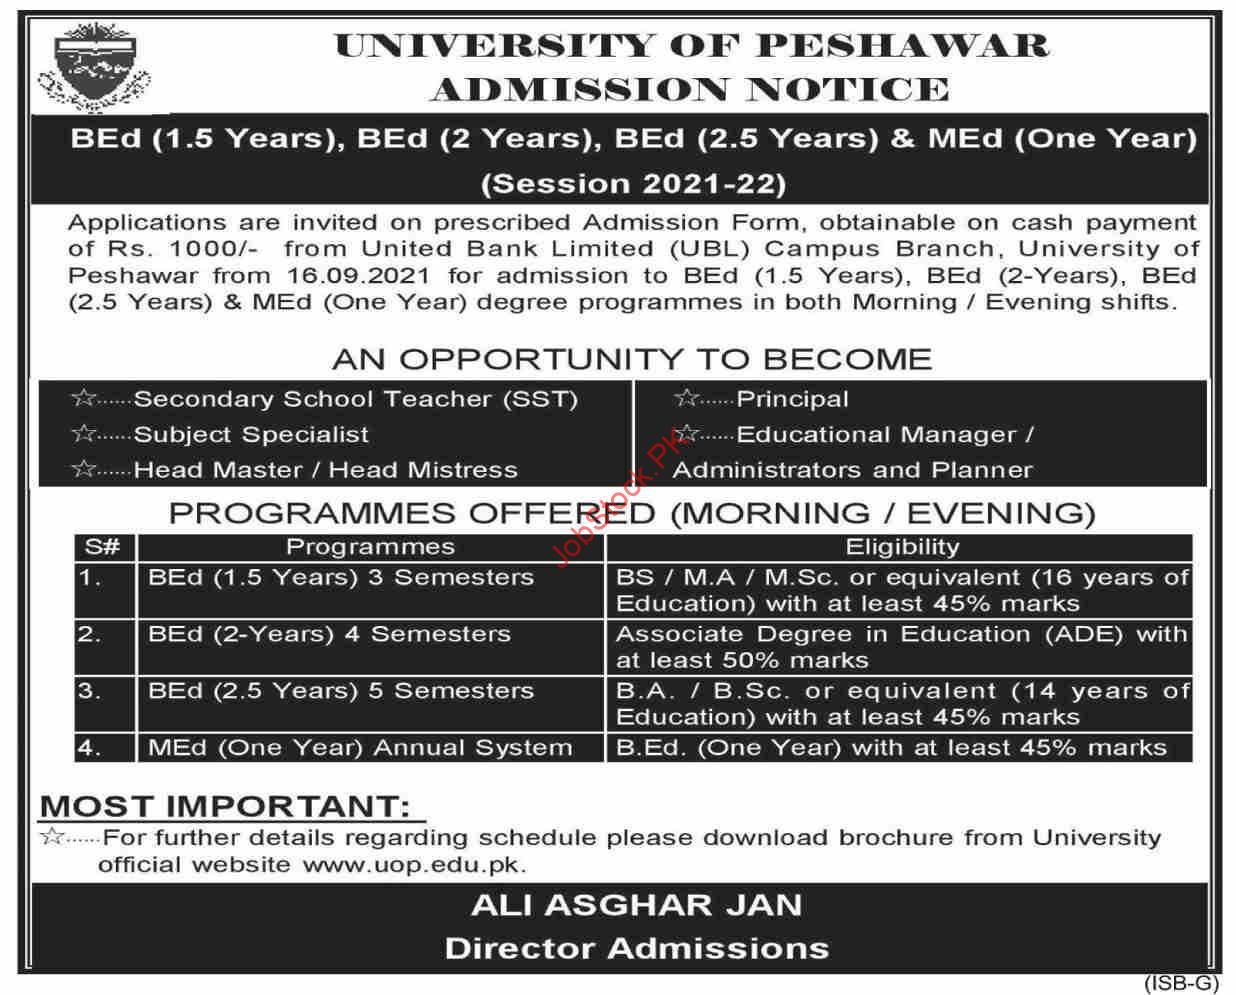 University Of Peshawar Admission & Jobs 2021 Latest